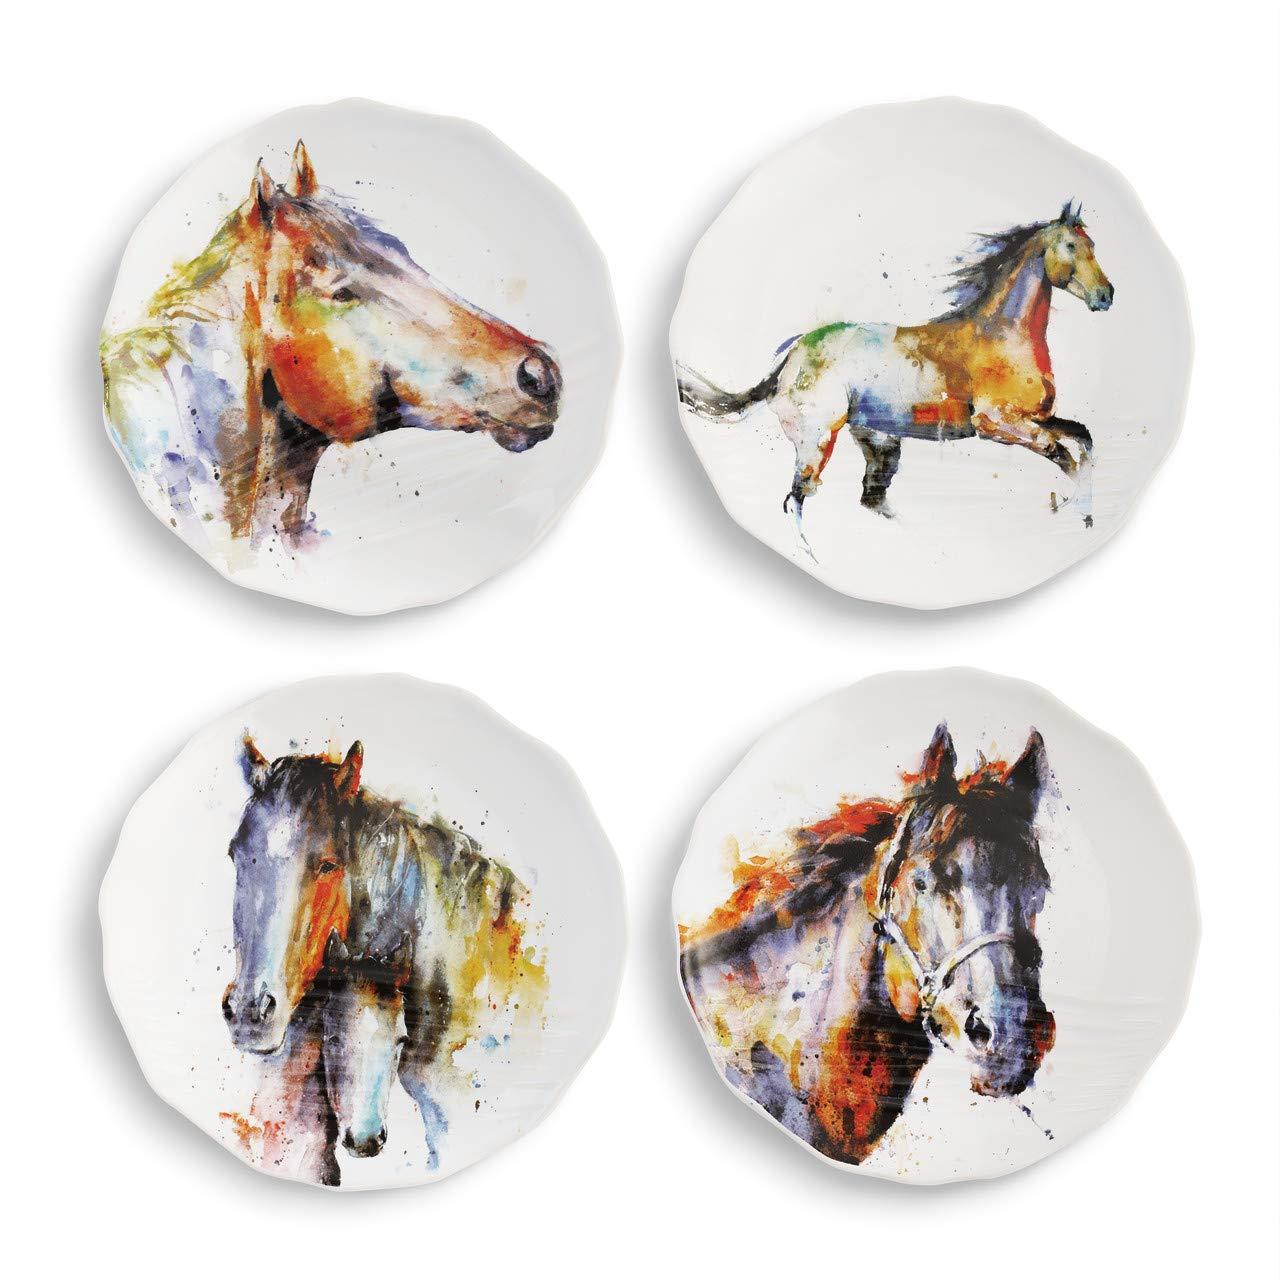 DEMDACO Dean Crouser Equine Watercolor 6 x 6 Ceramic Stoneware Decorative Appetizer Plates Set of 4